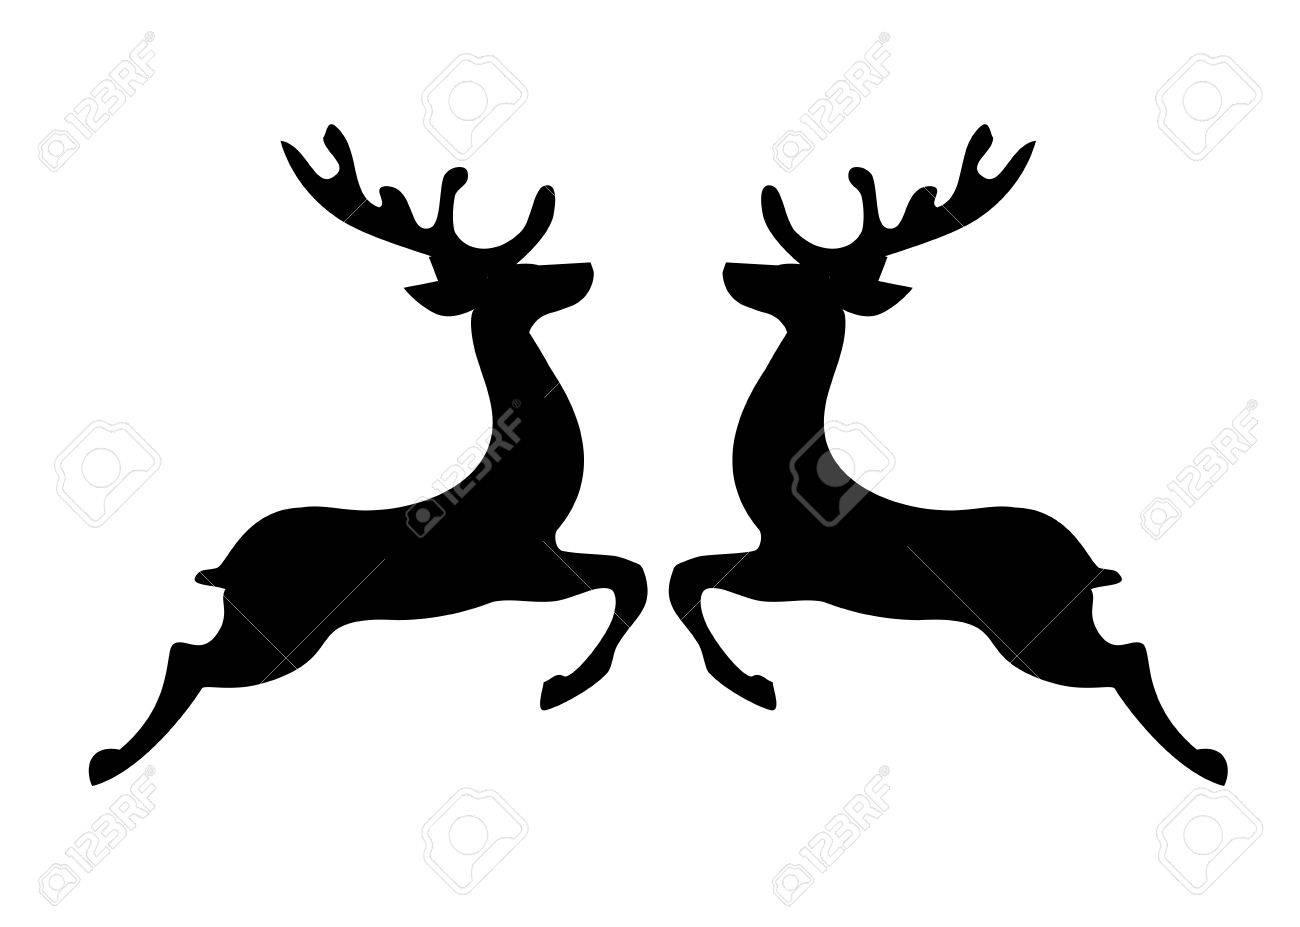 Christmas Reindeer Silhouette.Illustration Of Christmas Reindeer Silhouette